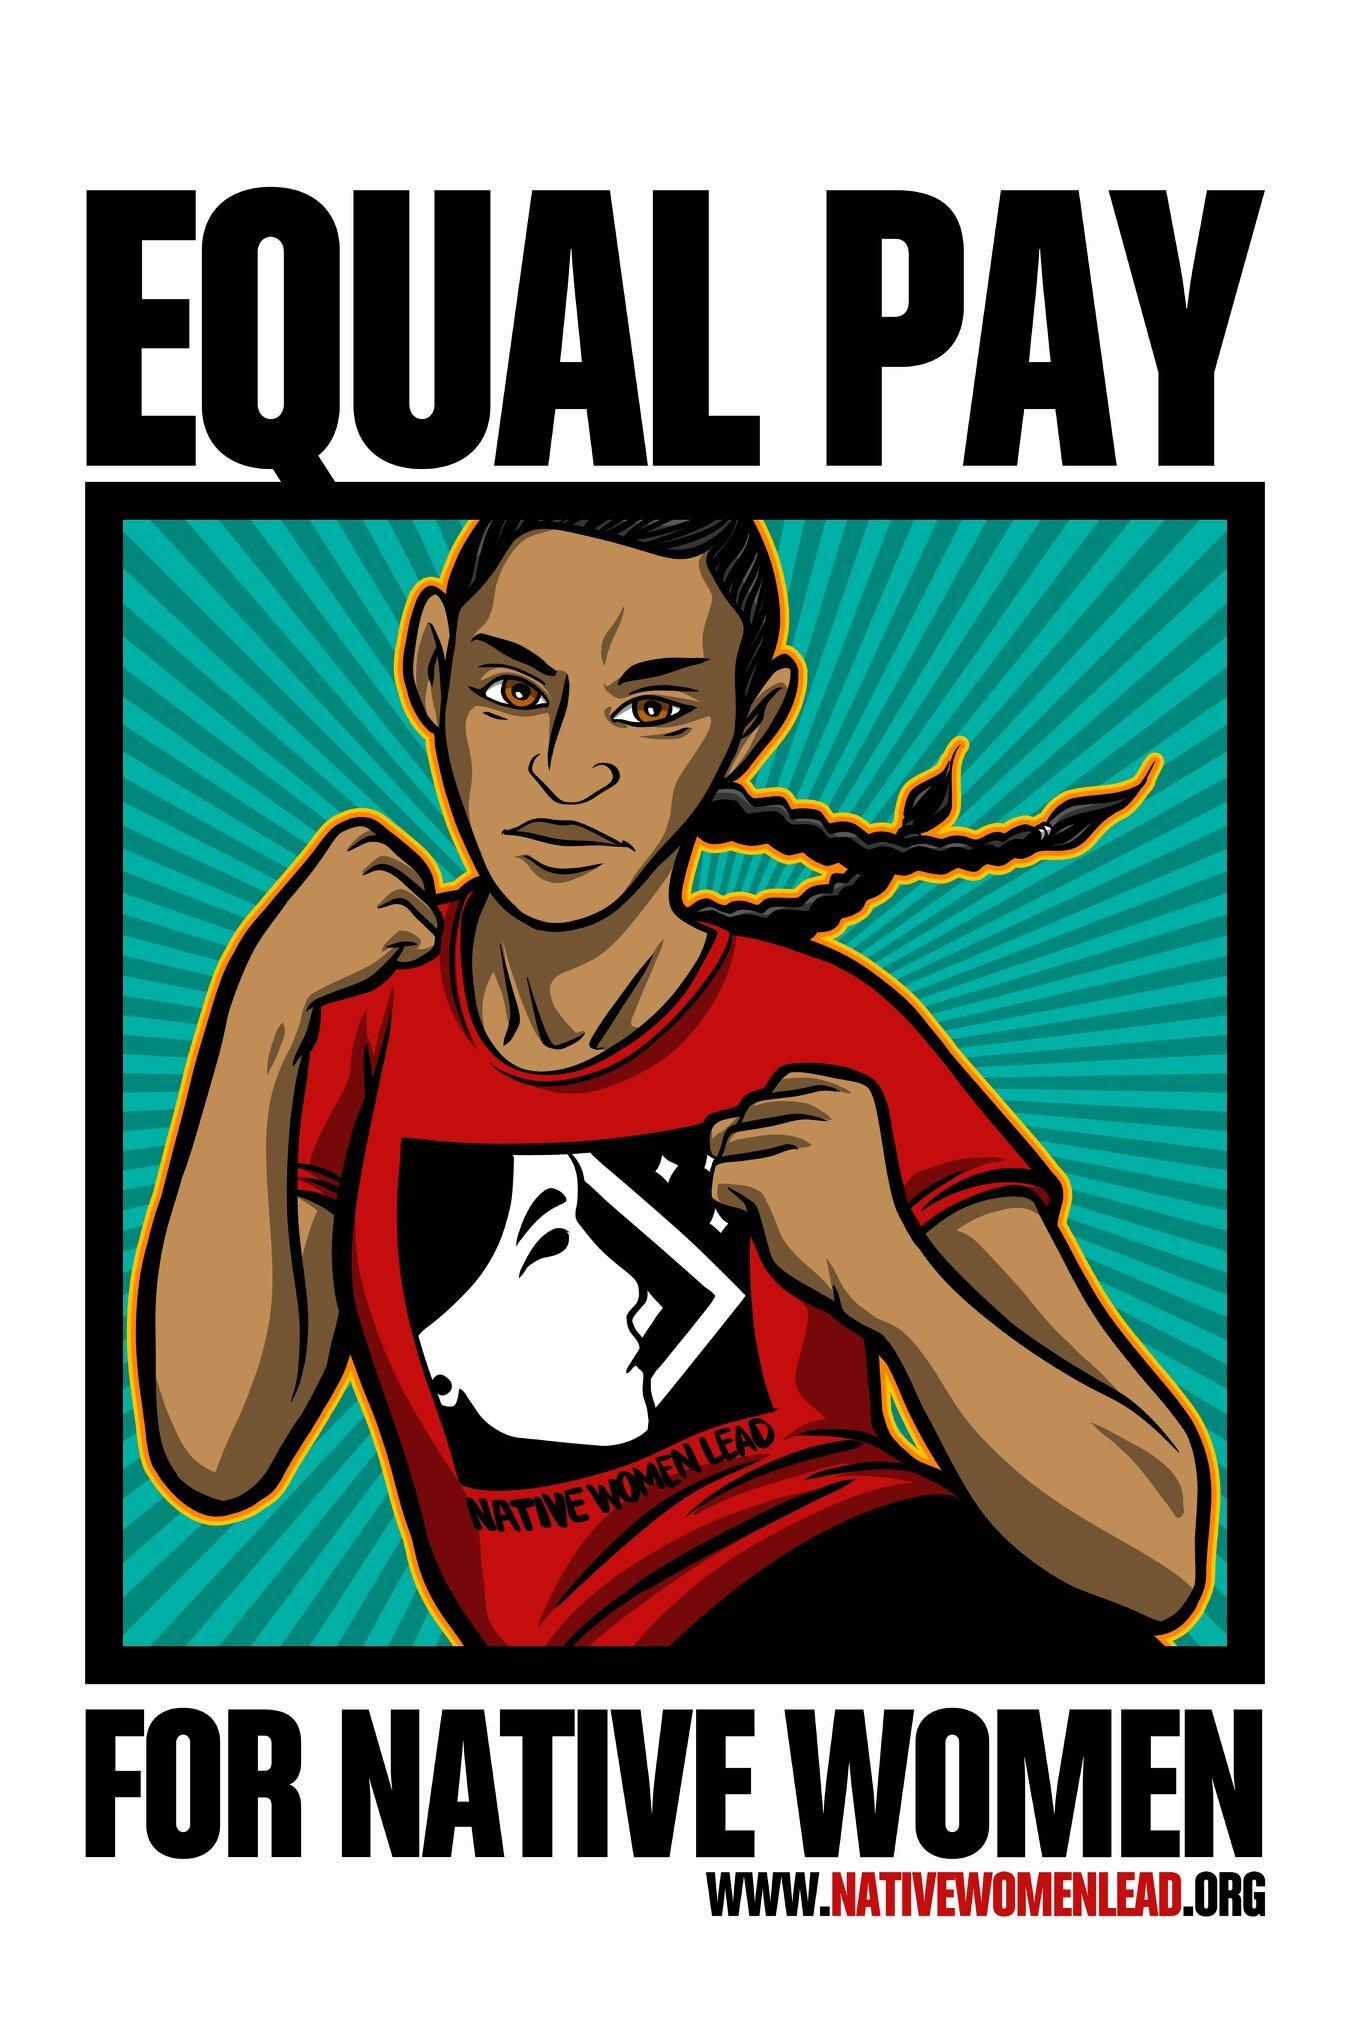 September 23, 2019 is #NativeWomensEqualPayday #DemandMore #EquityforNativewomen